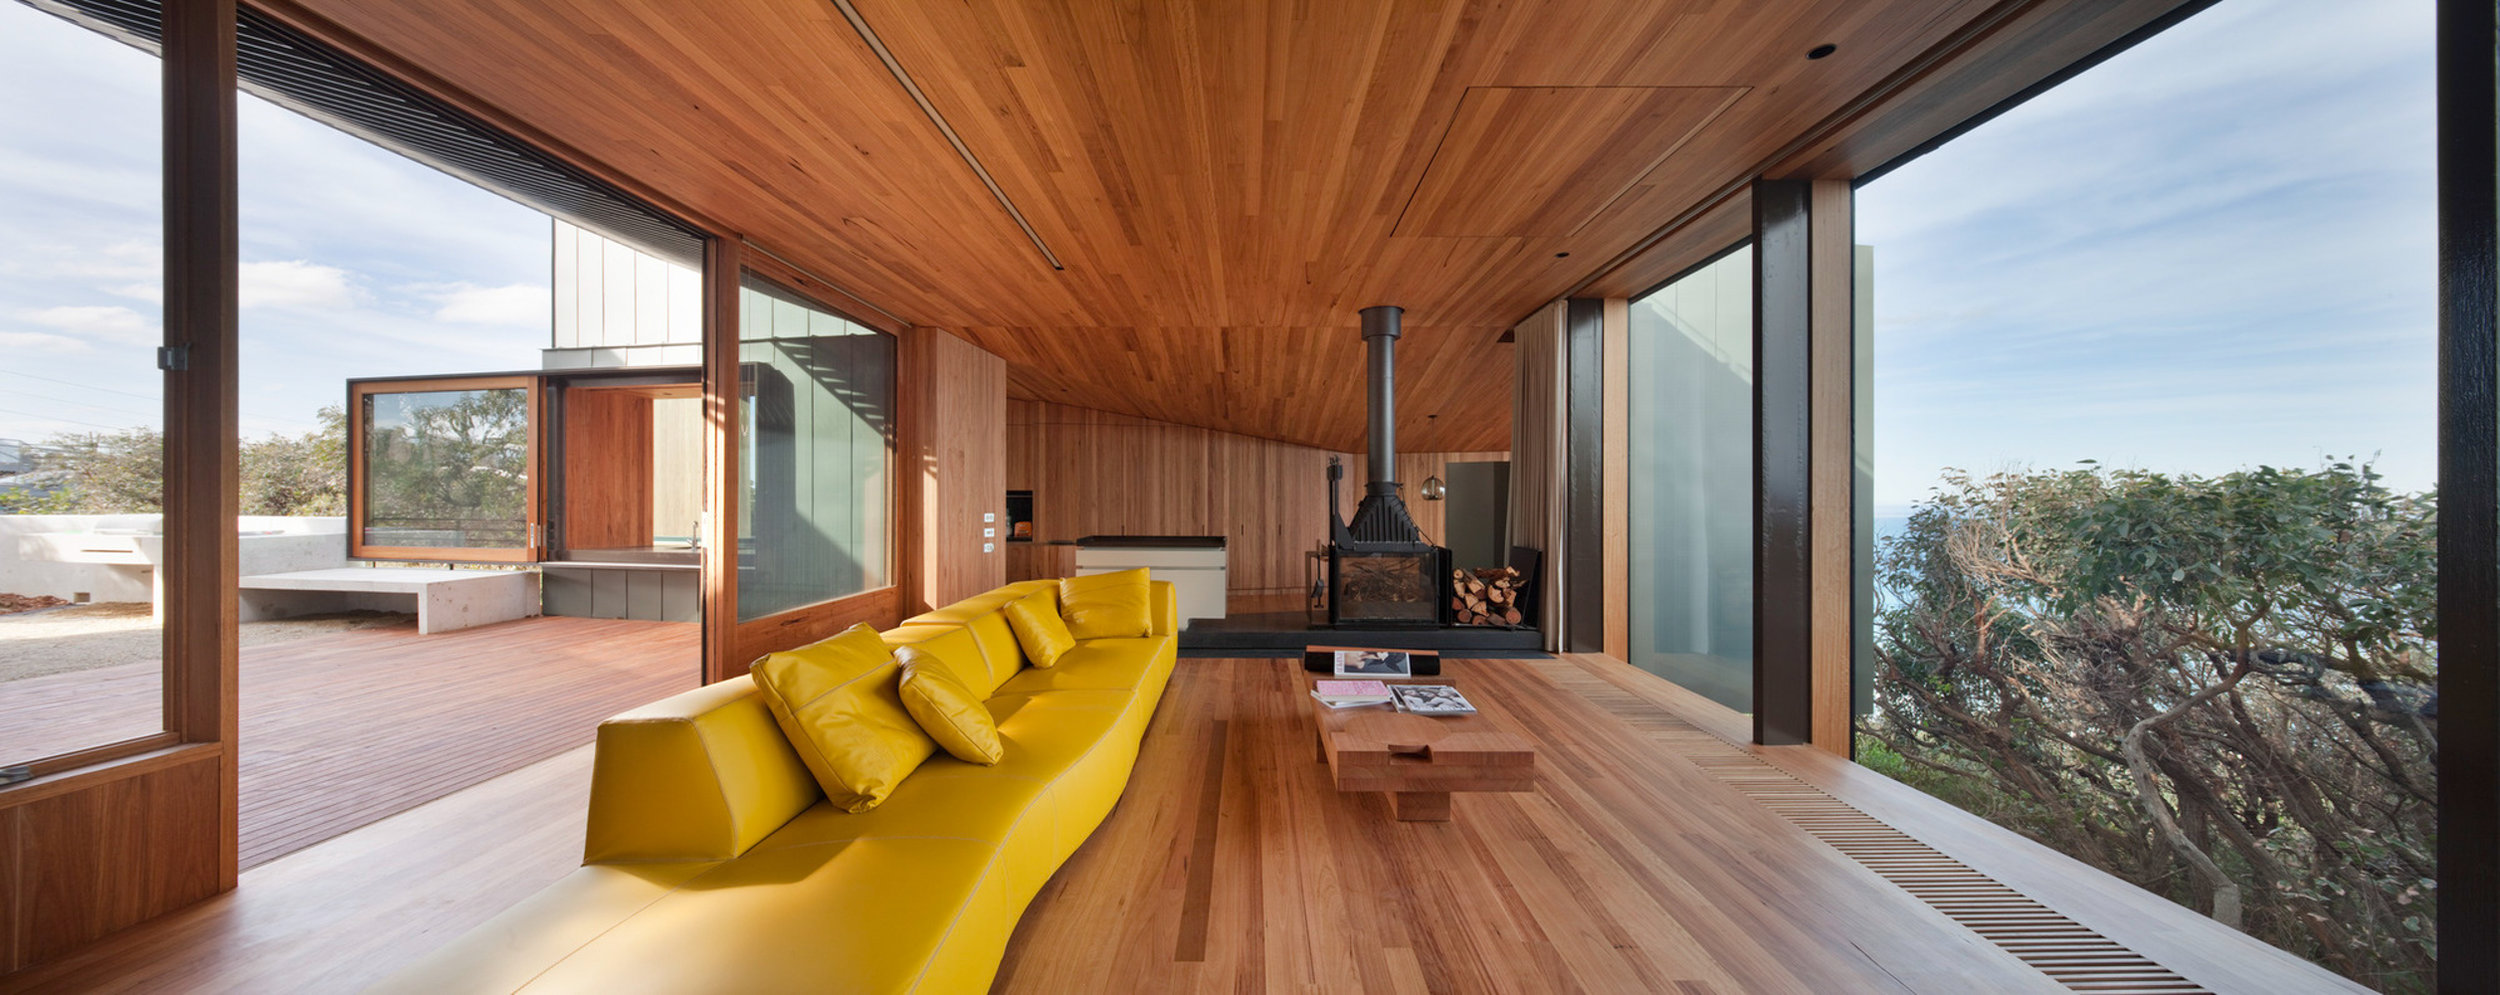 fairhaven-beach-house-john-wardle-architects-the-design-emotive-06.jpg